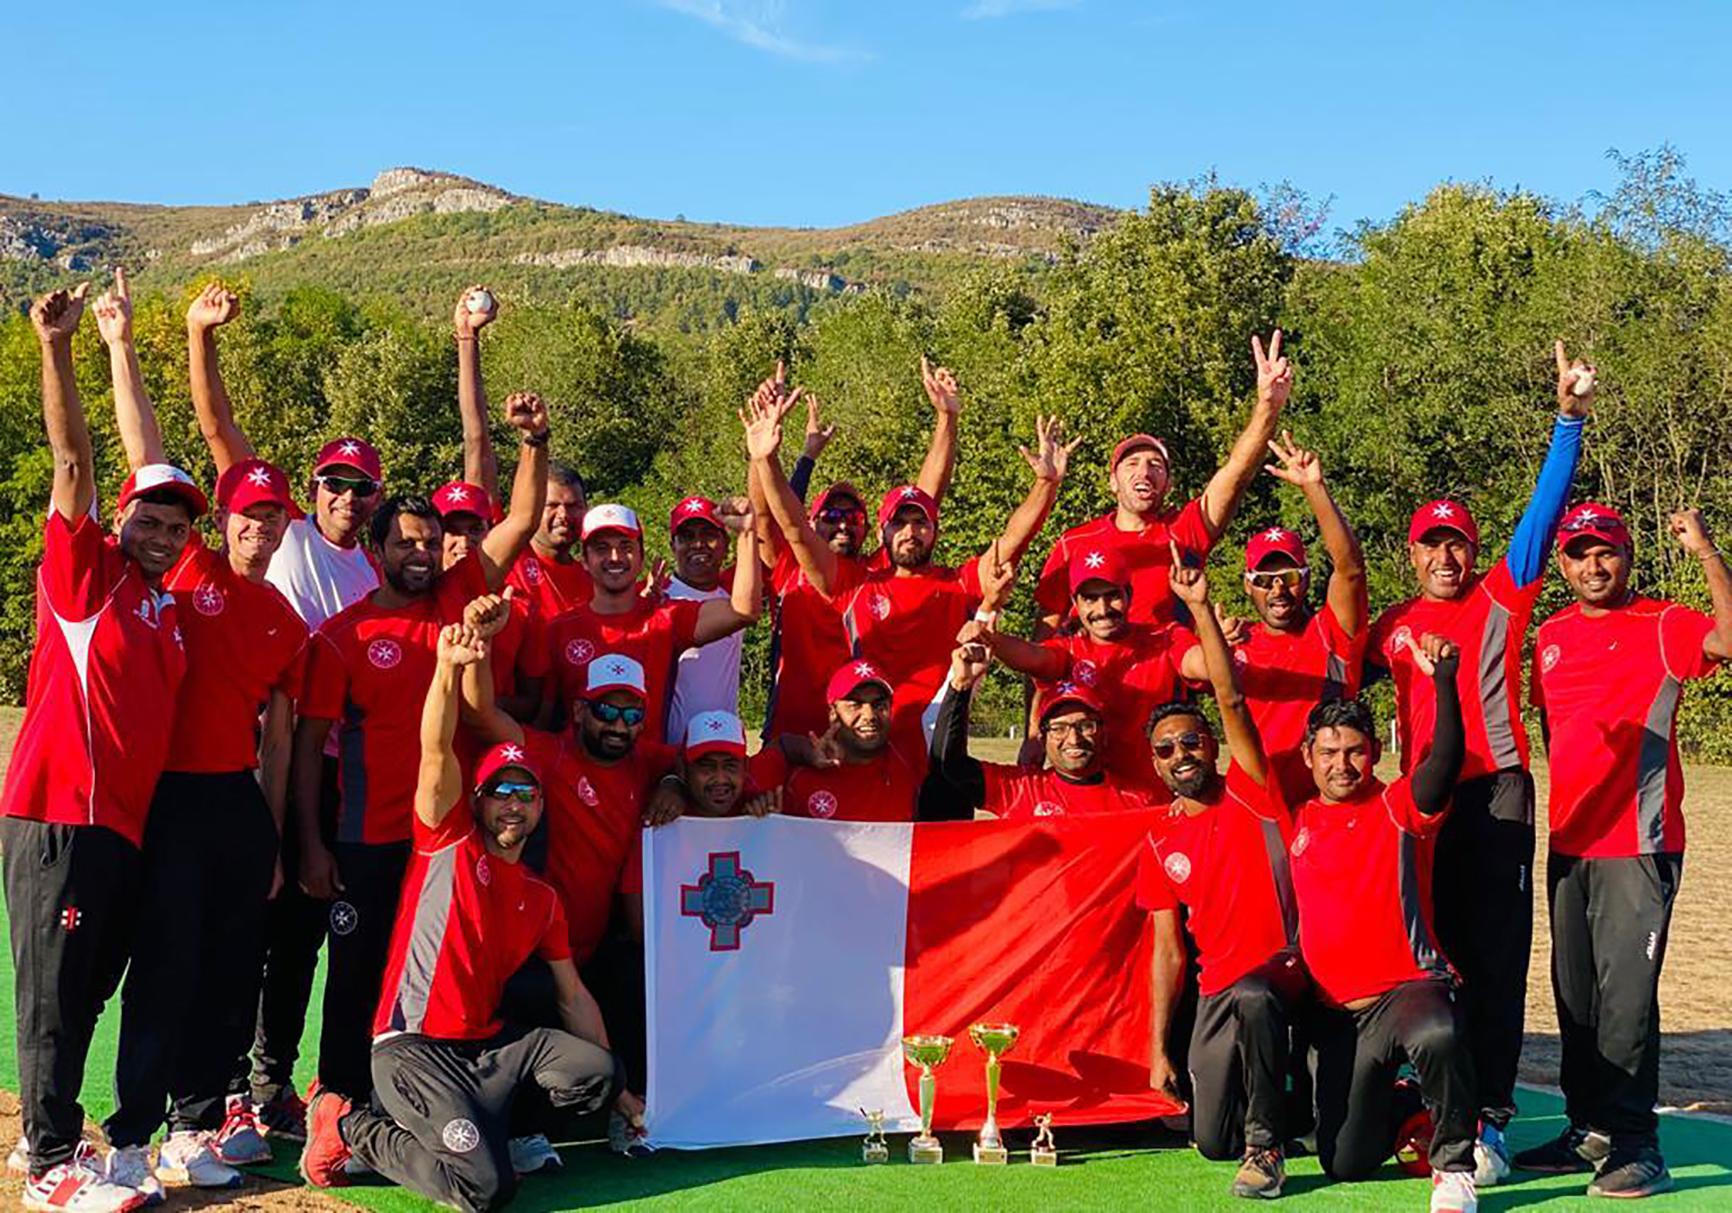 Malta vs Belgium Dream11 Prediction Fantasy Cricket Tips Dream11 Team